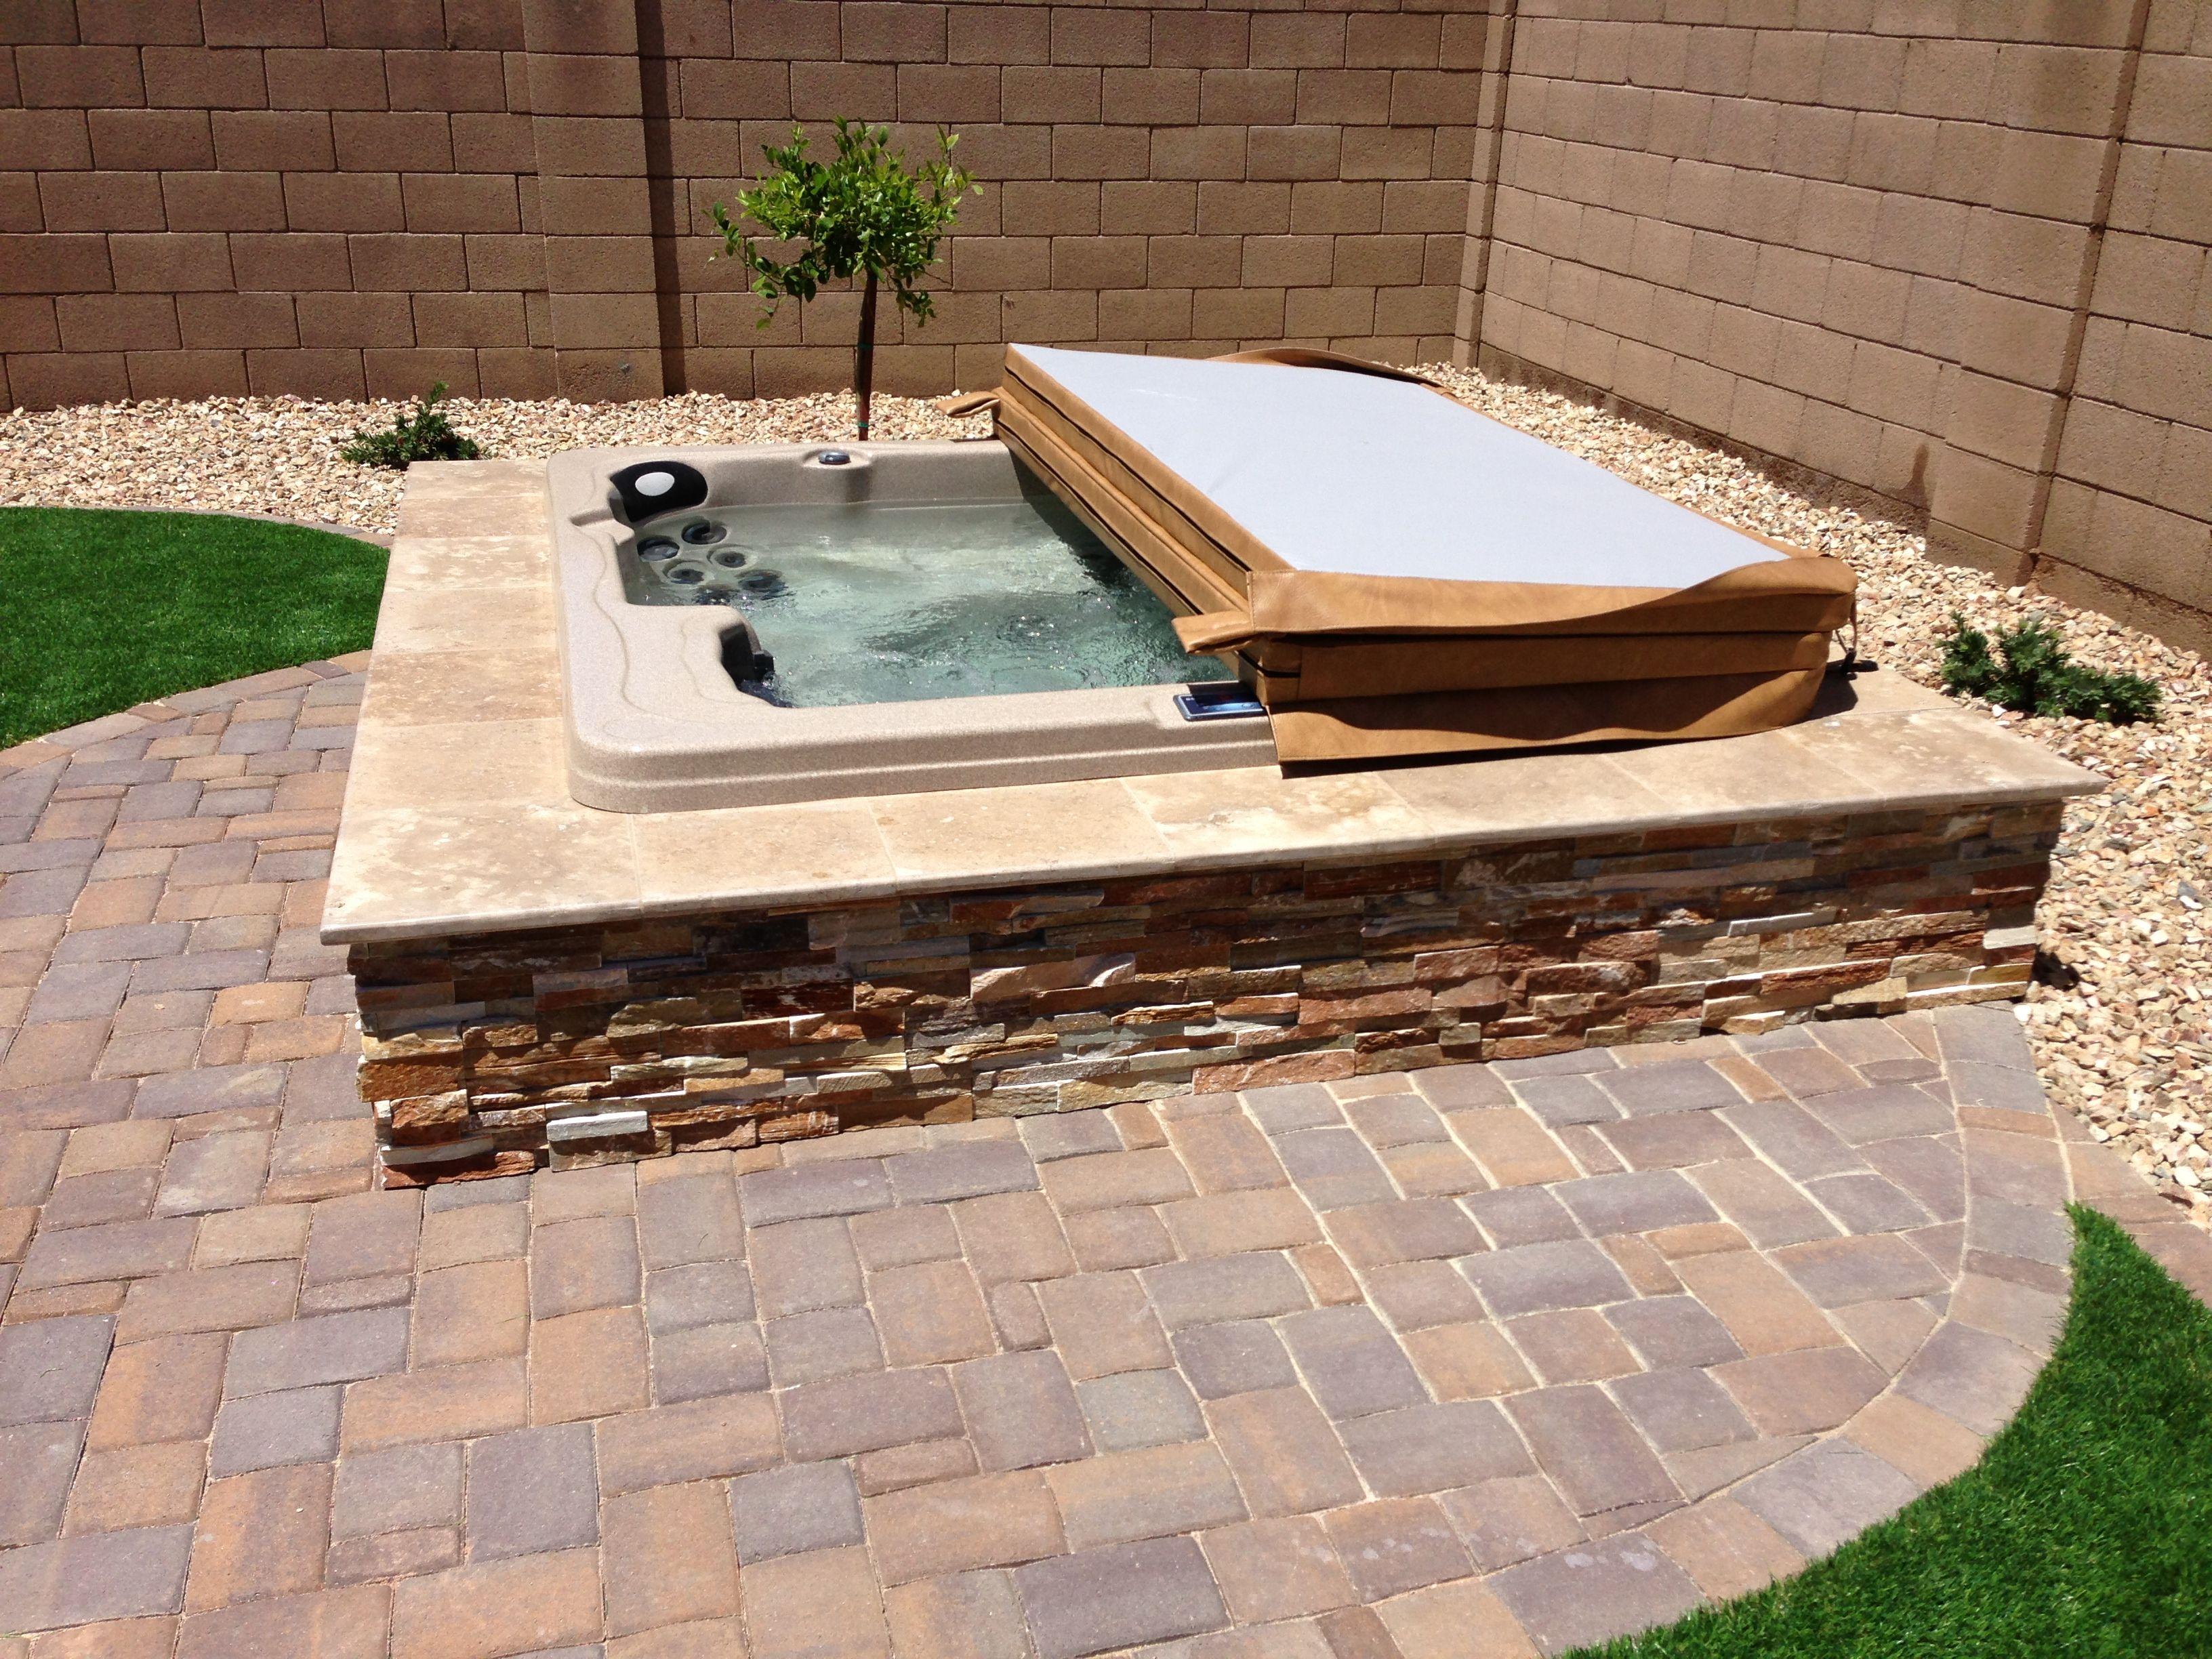 Arizona Backyard Landscapes u003d Place To Be